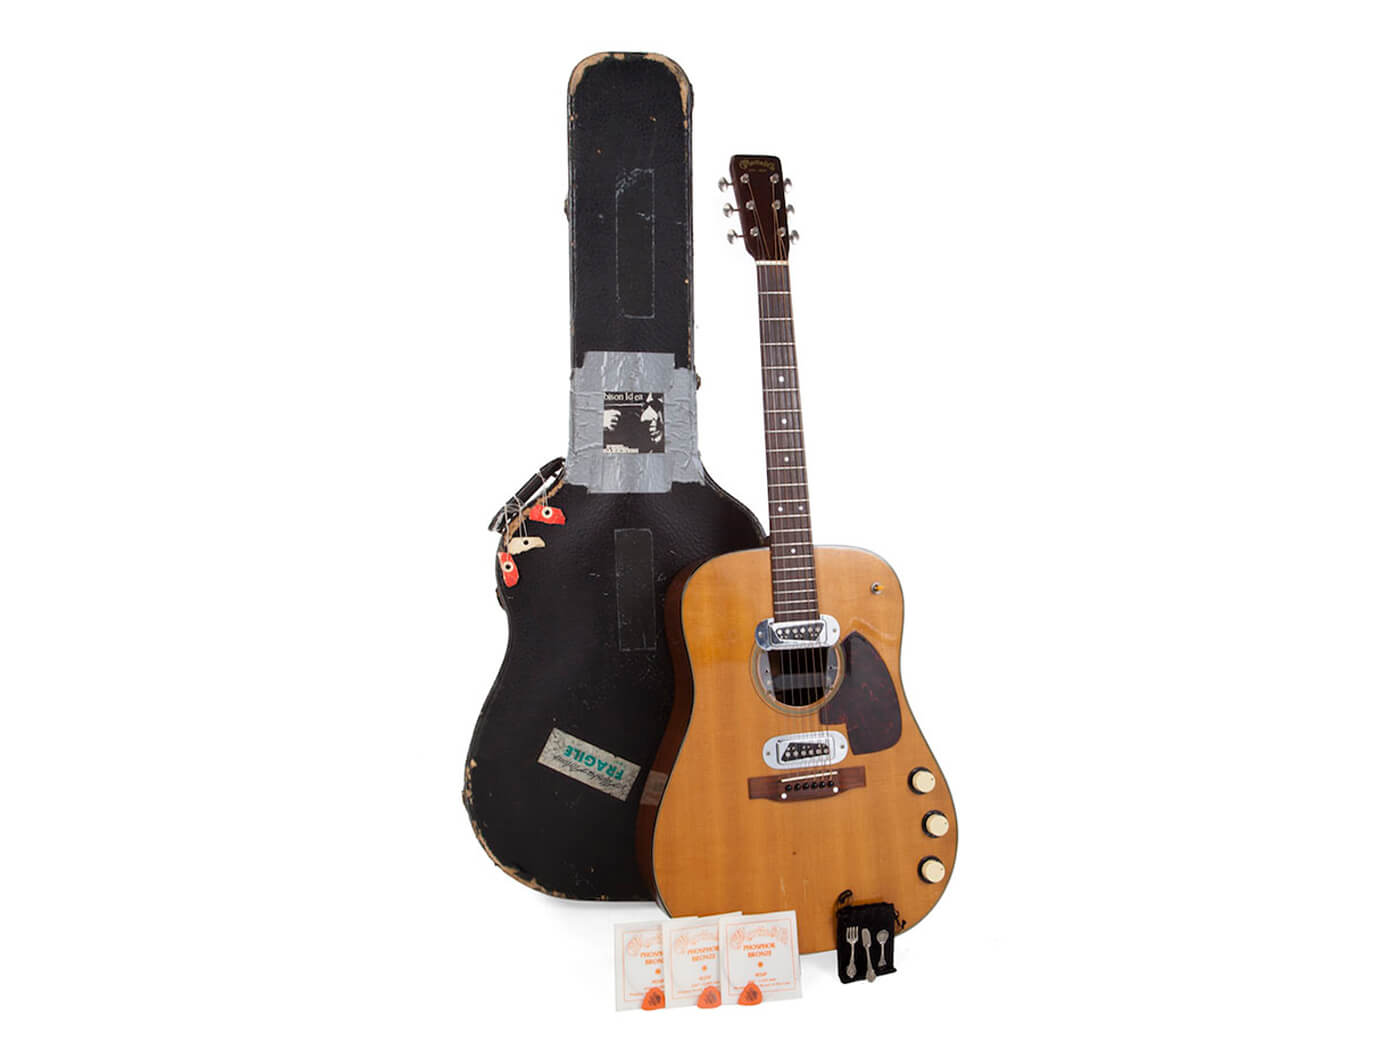 kurt cobain's guitar auction kit